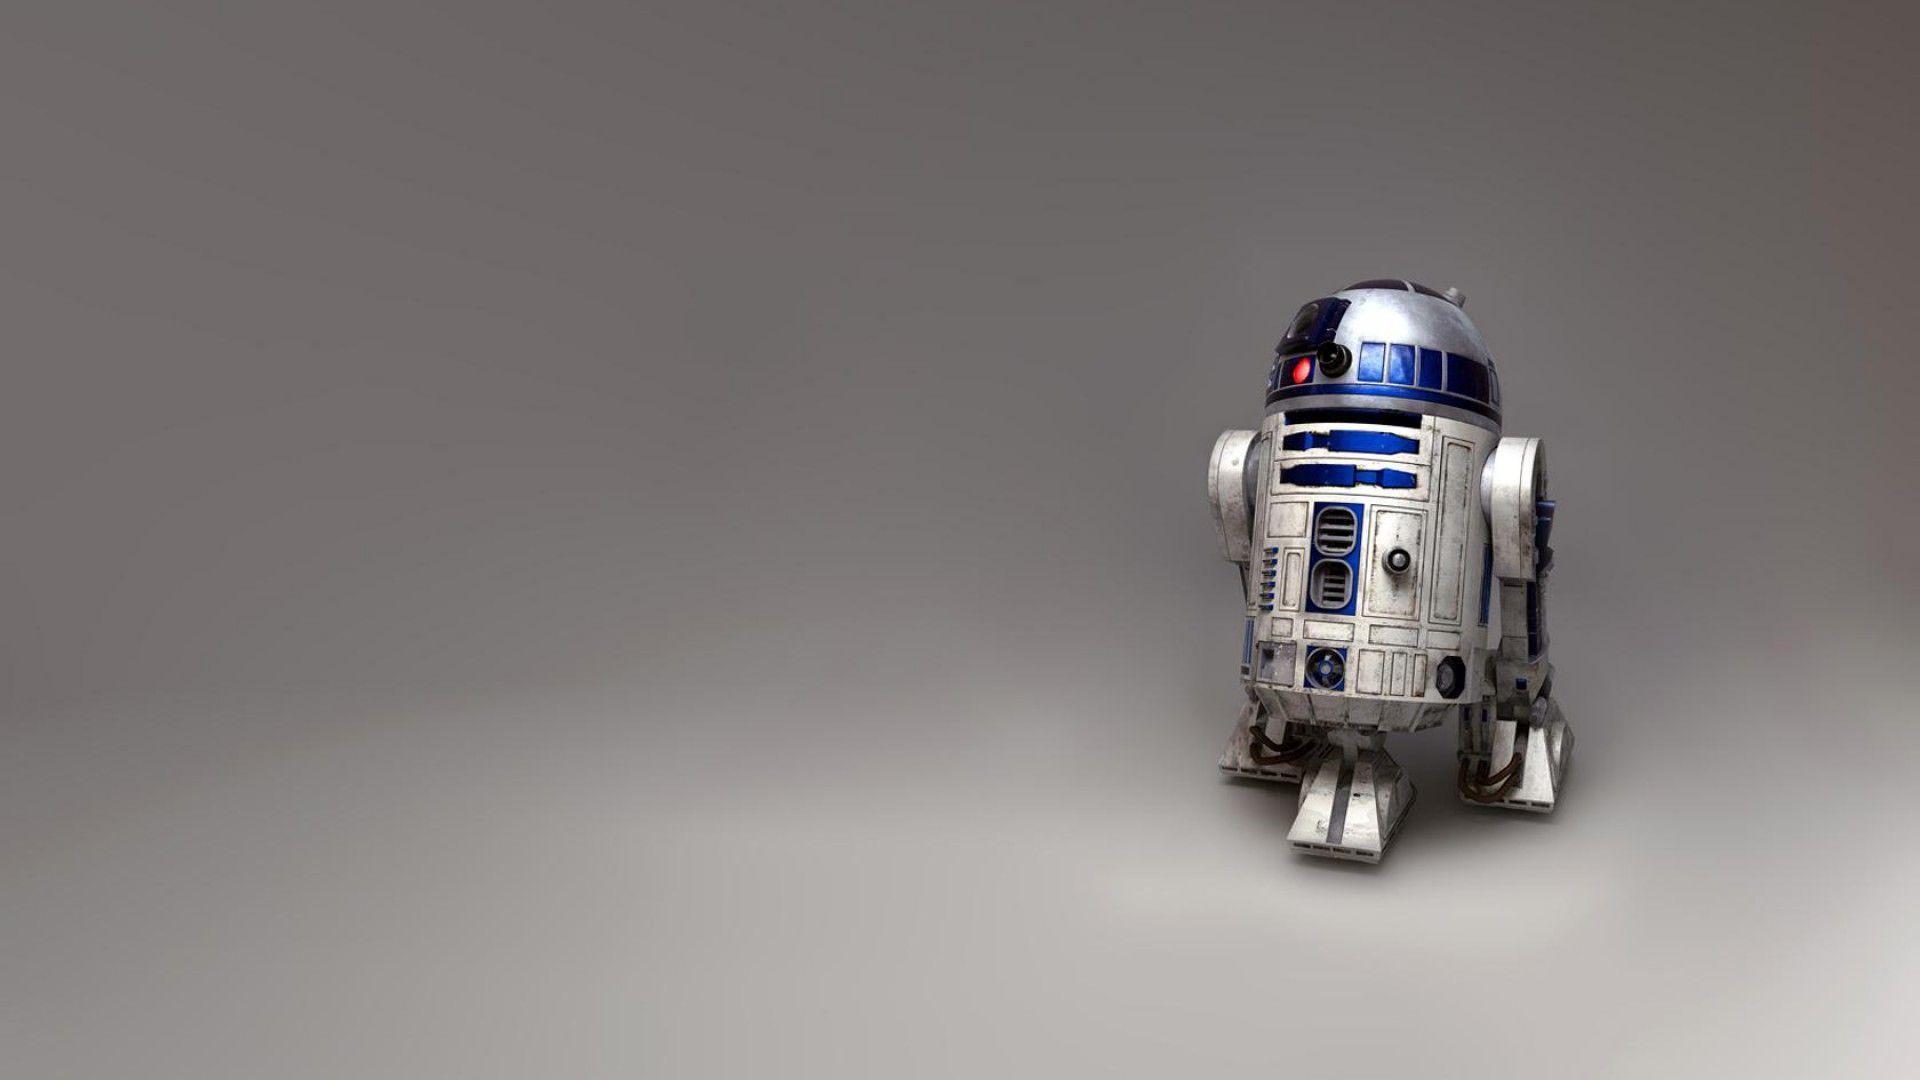 Star Wars 1080p Wallpapers – Wallpaper Cave